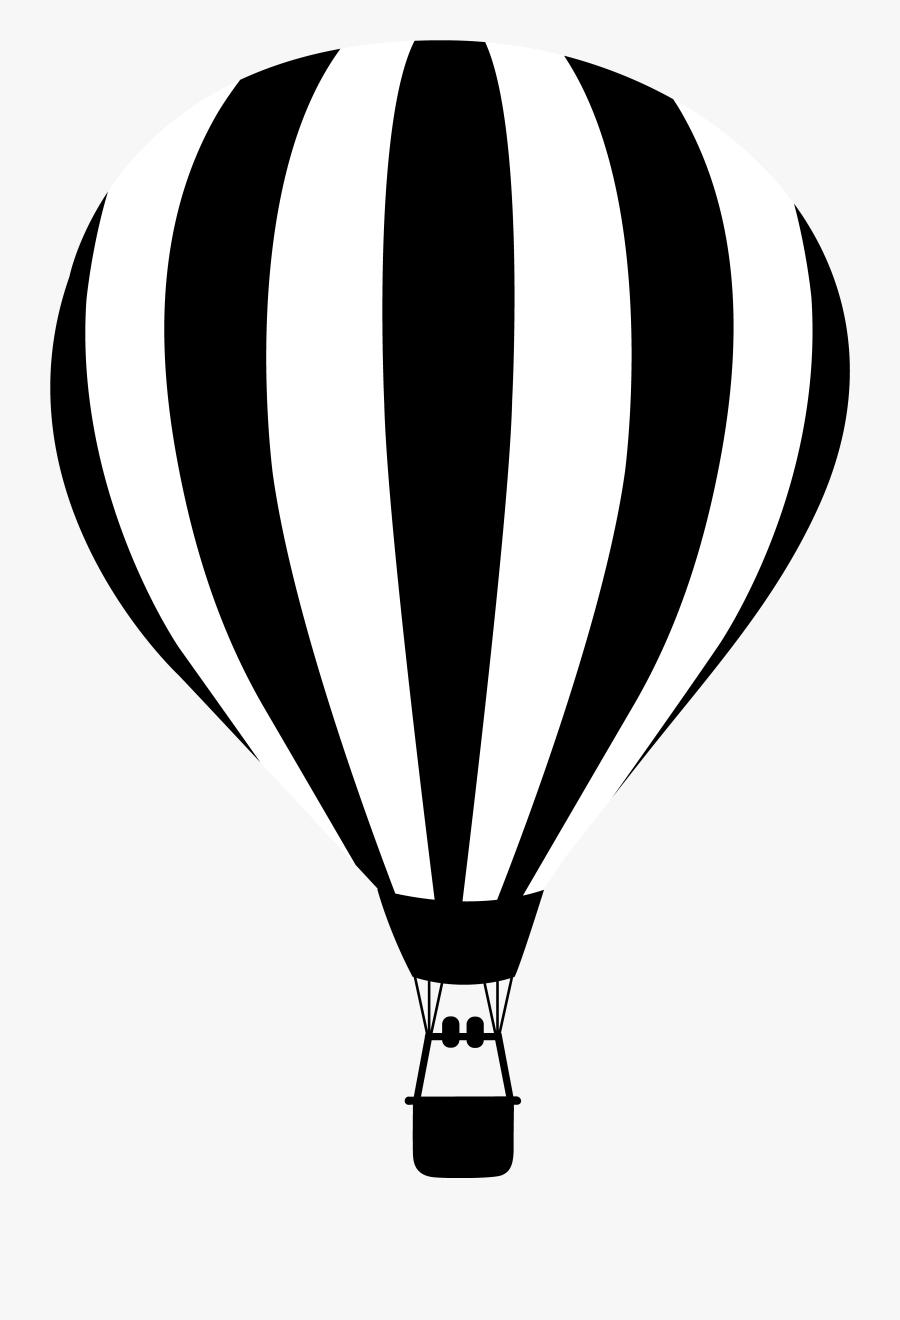 Hot Air Balloon Vector Png, Transparent Clipart